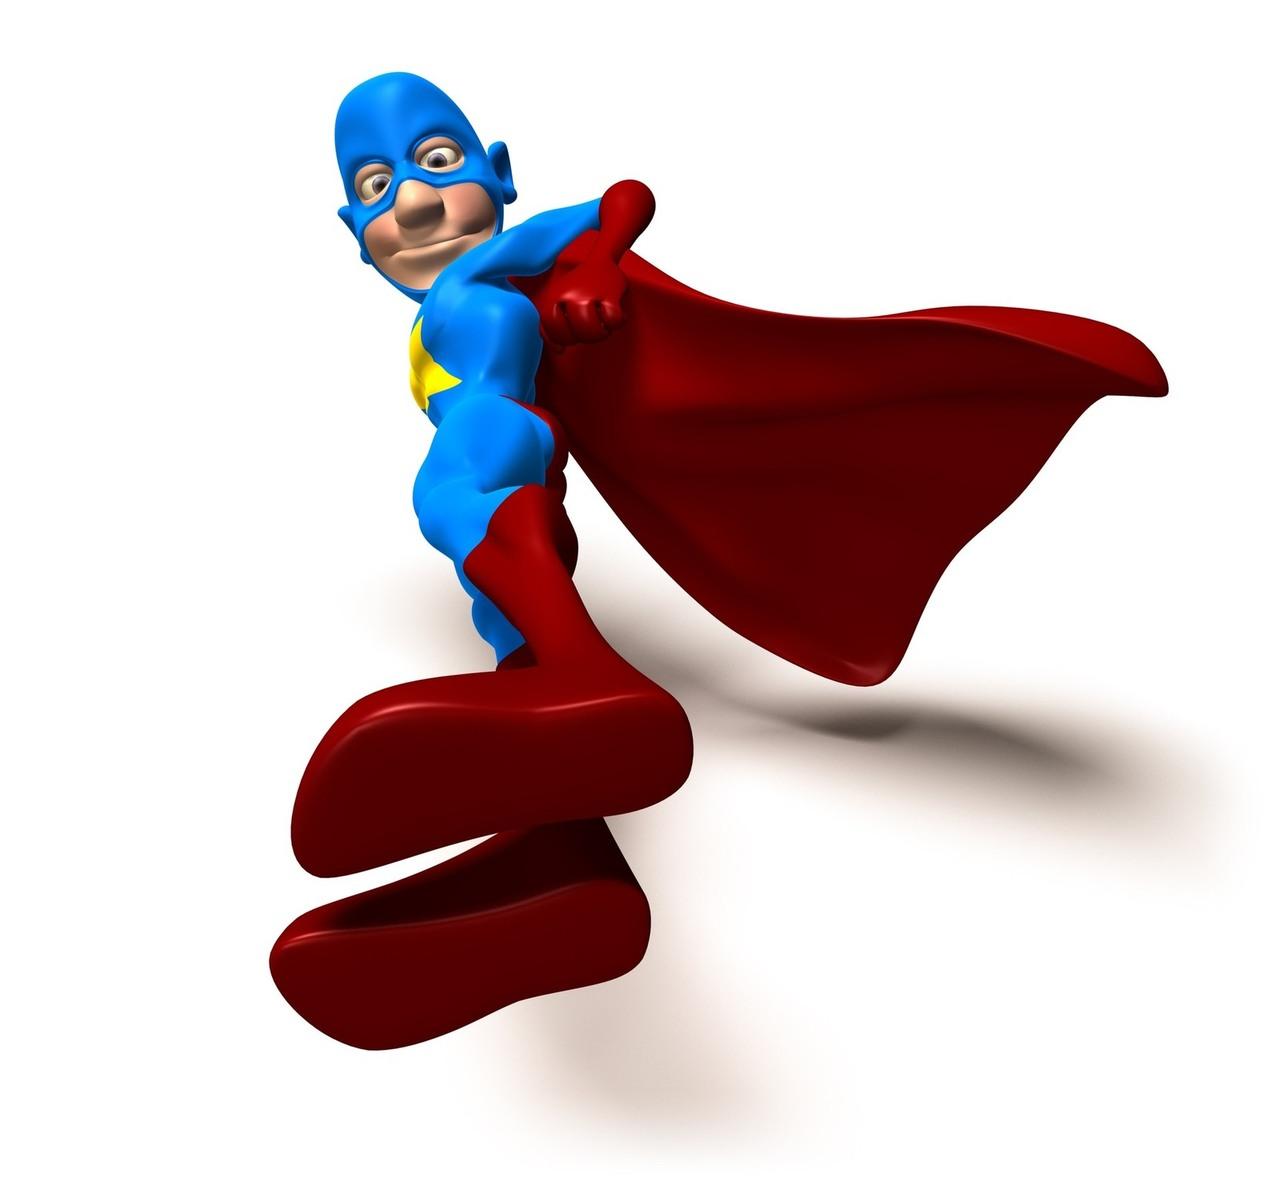 superhero-1246057-1279x1184